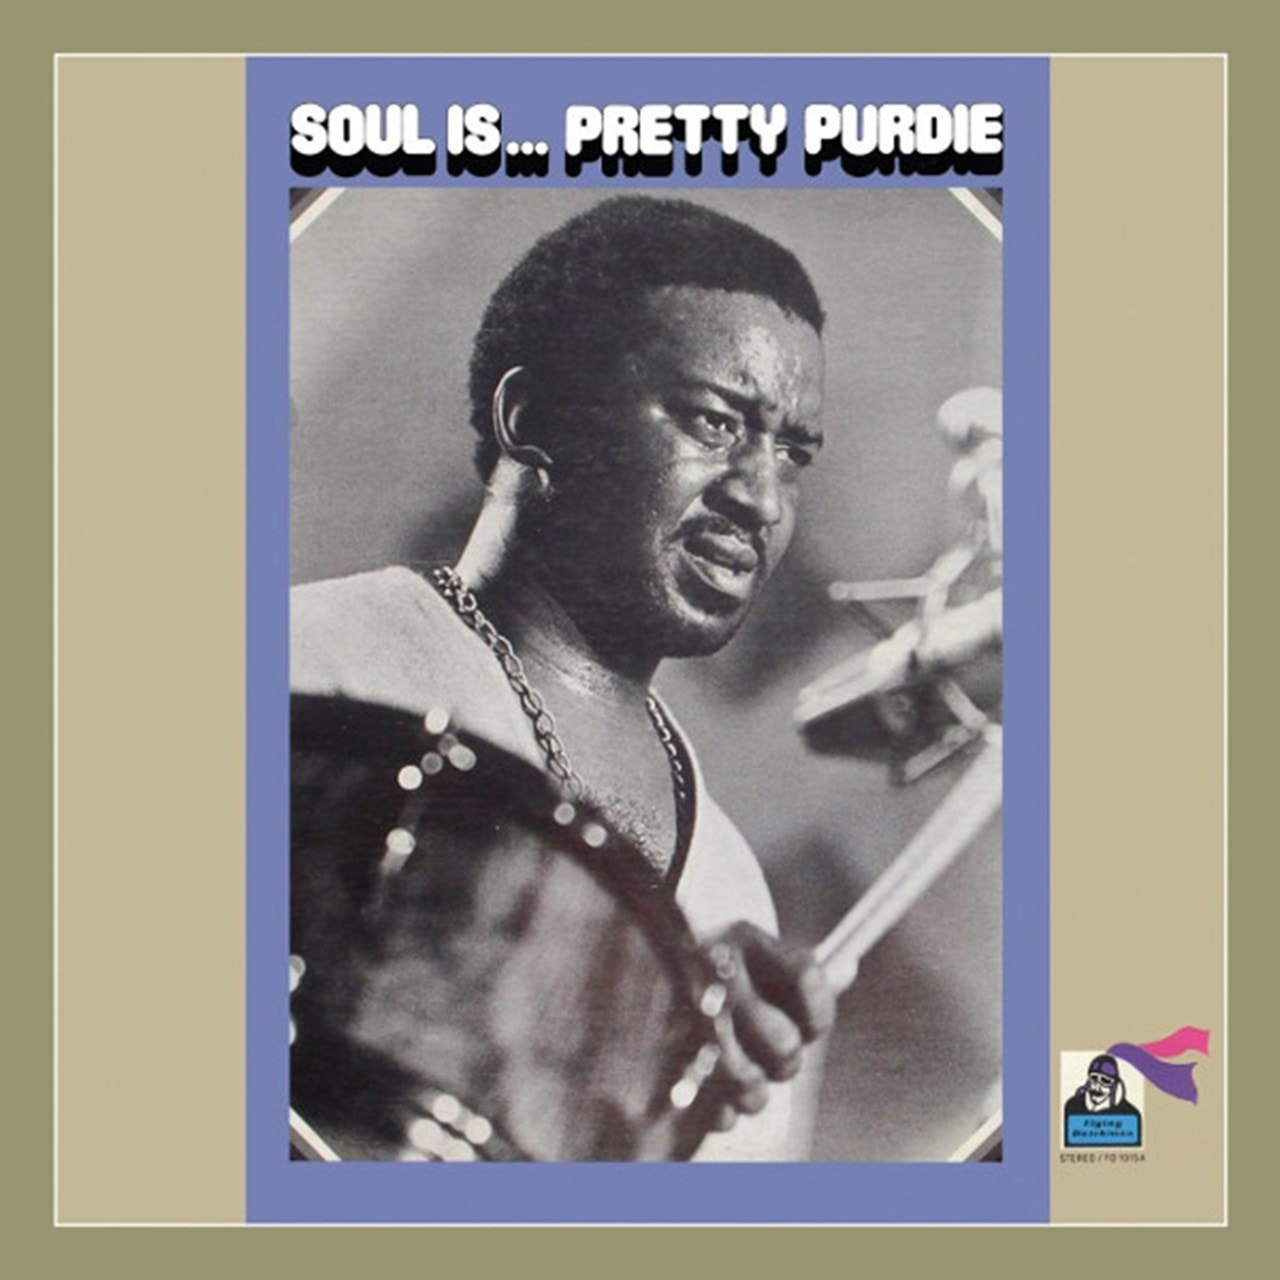 Soul Is... Pretty Purdie - 1